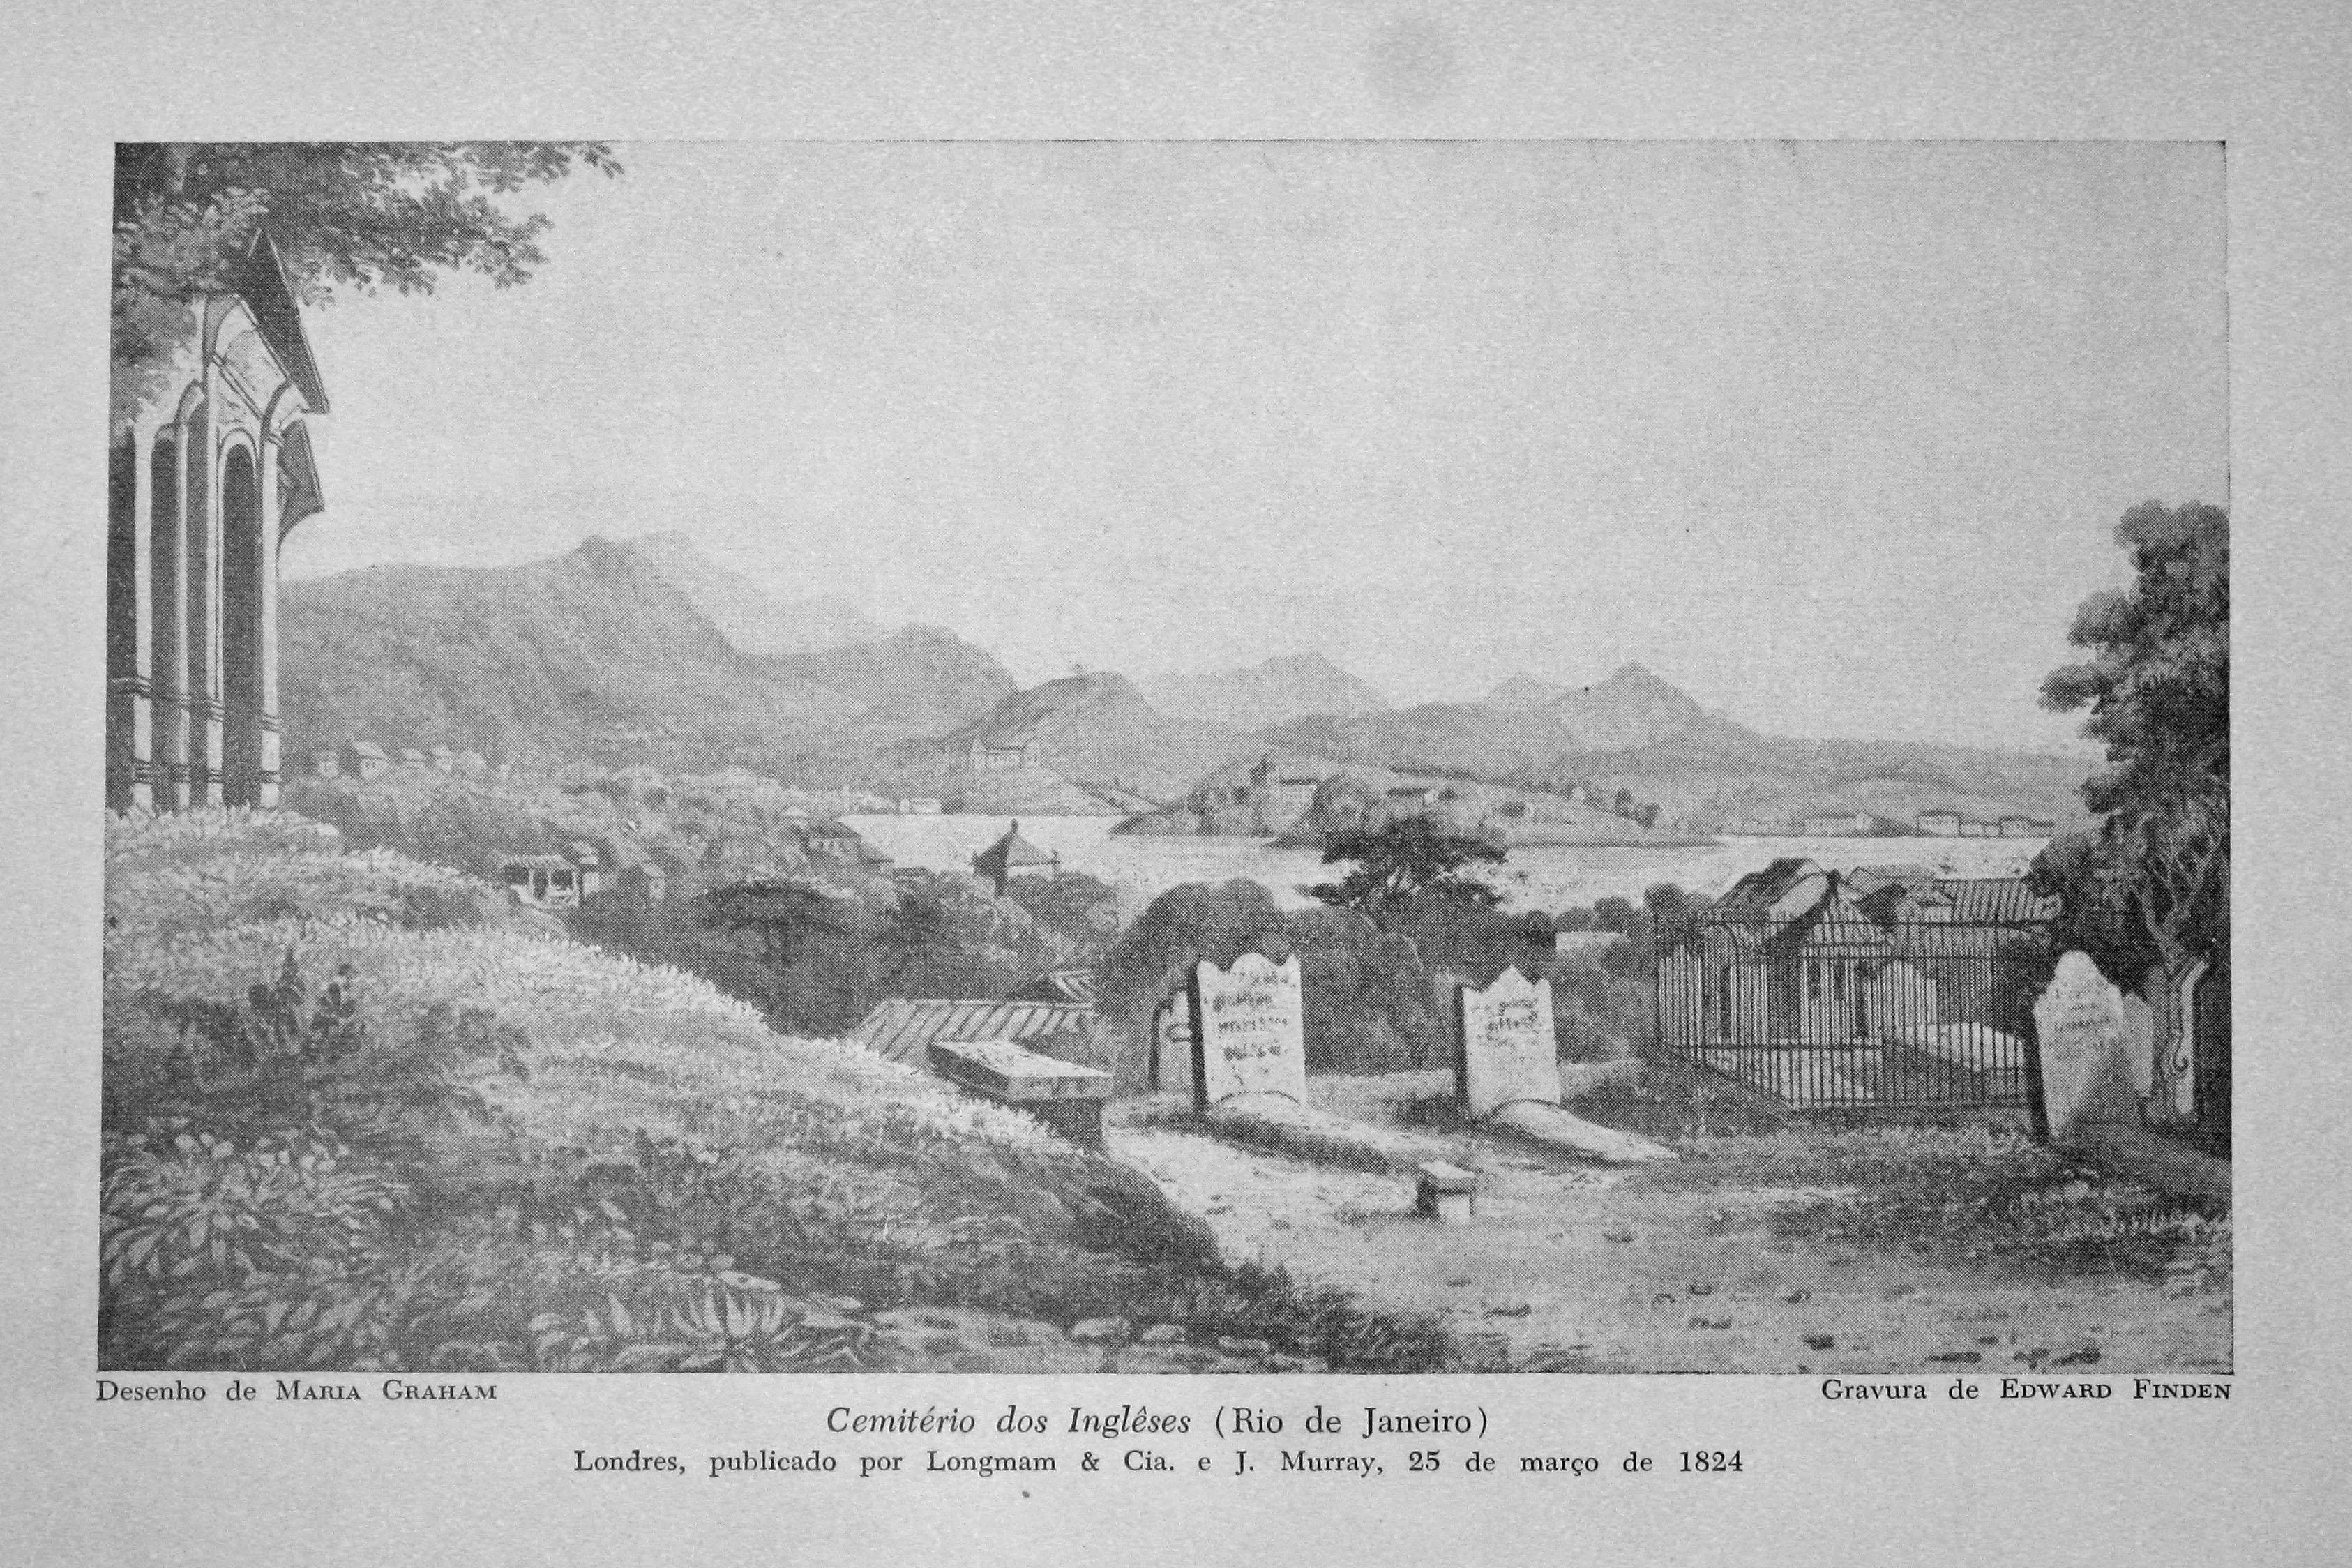 file maria graham edward finden cemiterio ingleses 1824 jpg